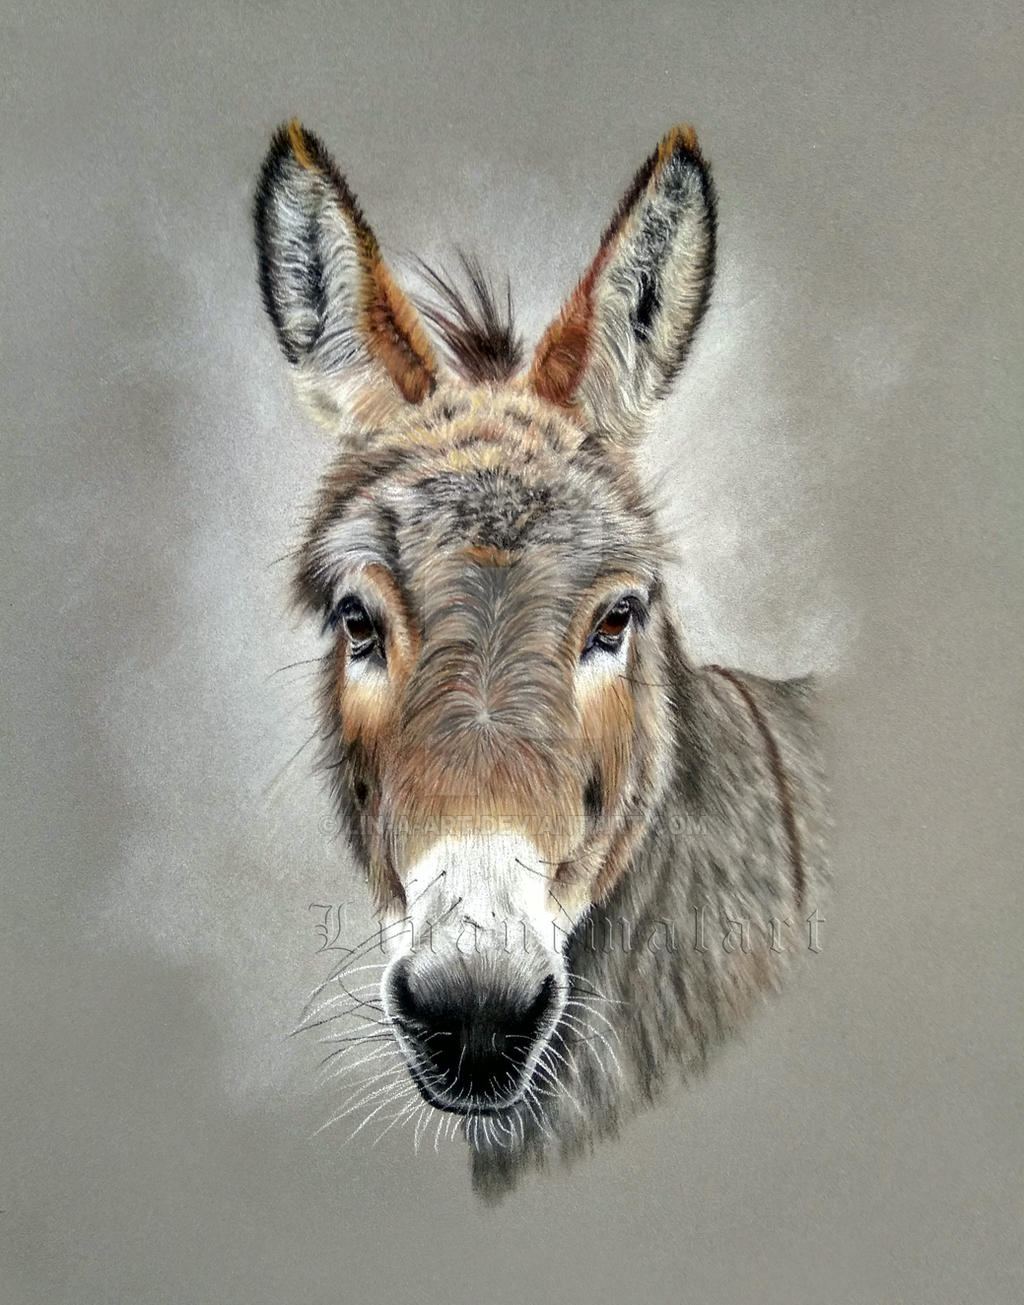 Donkey by Lin-a-art